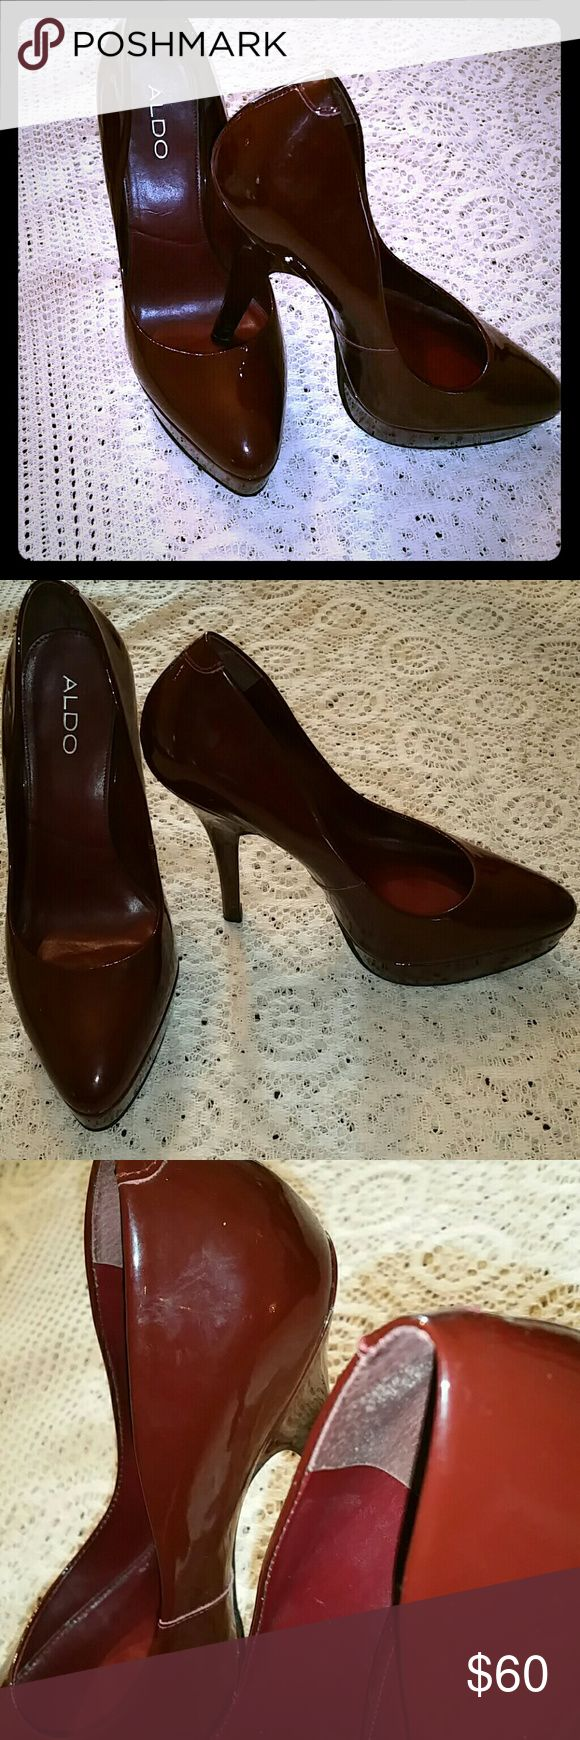 "Women's stiletto heels Burgundy stiletto, patent leather 6"" platform heels. Aldo Shoes Platforms"